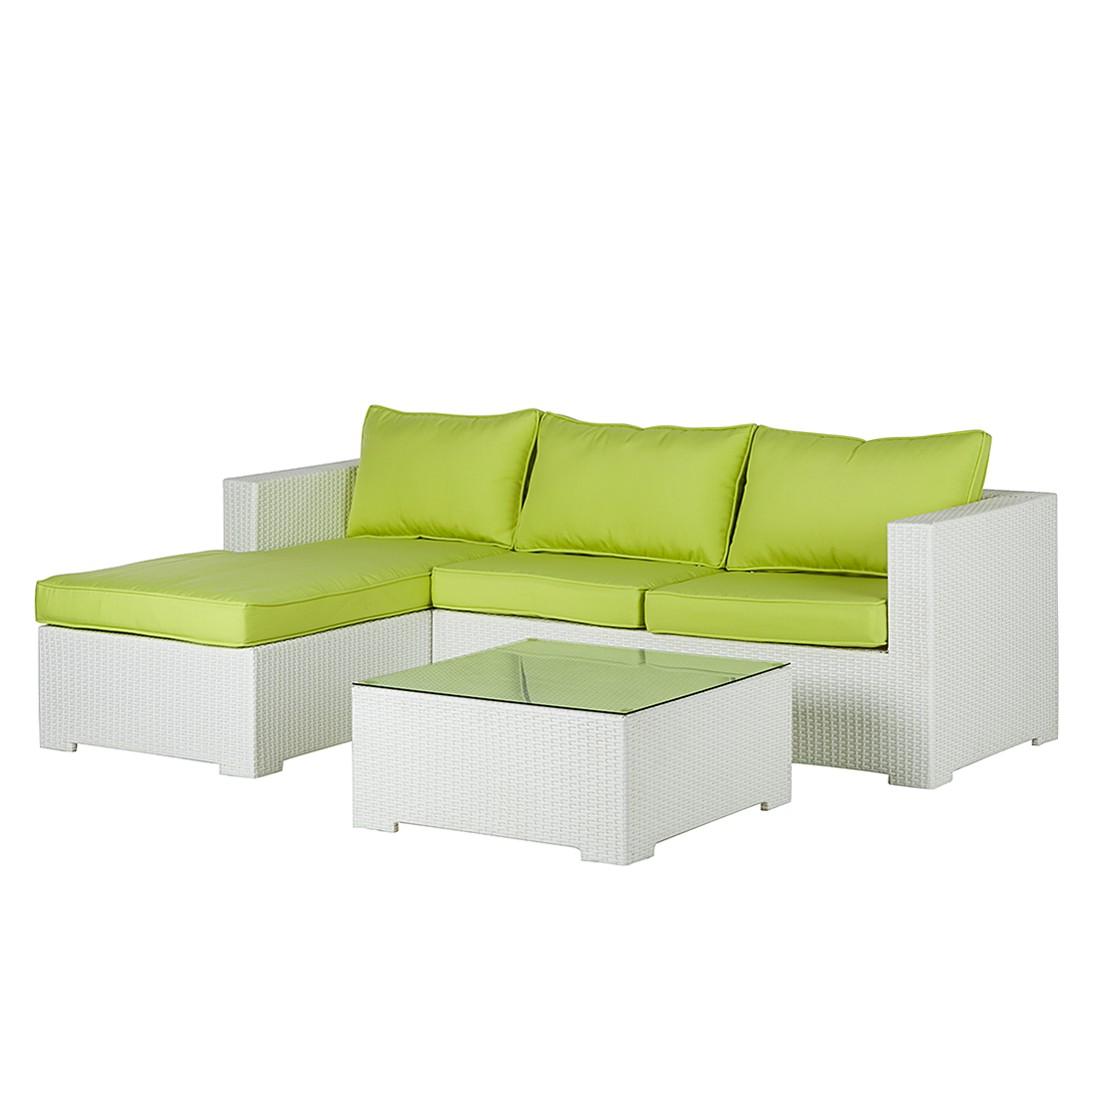 Lounge Sitzgruppe White Comfort (3-teilig) - Polyrattan/Textil - Weiß/Kiwi, Fredriks